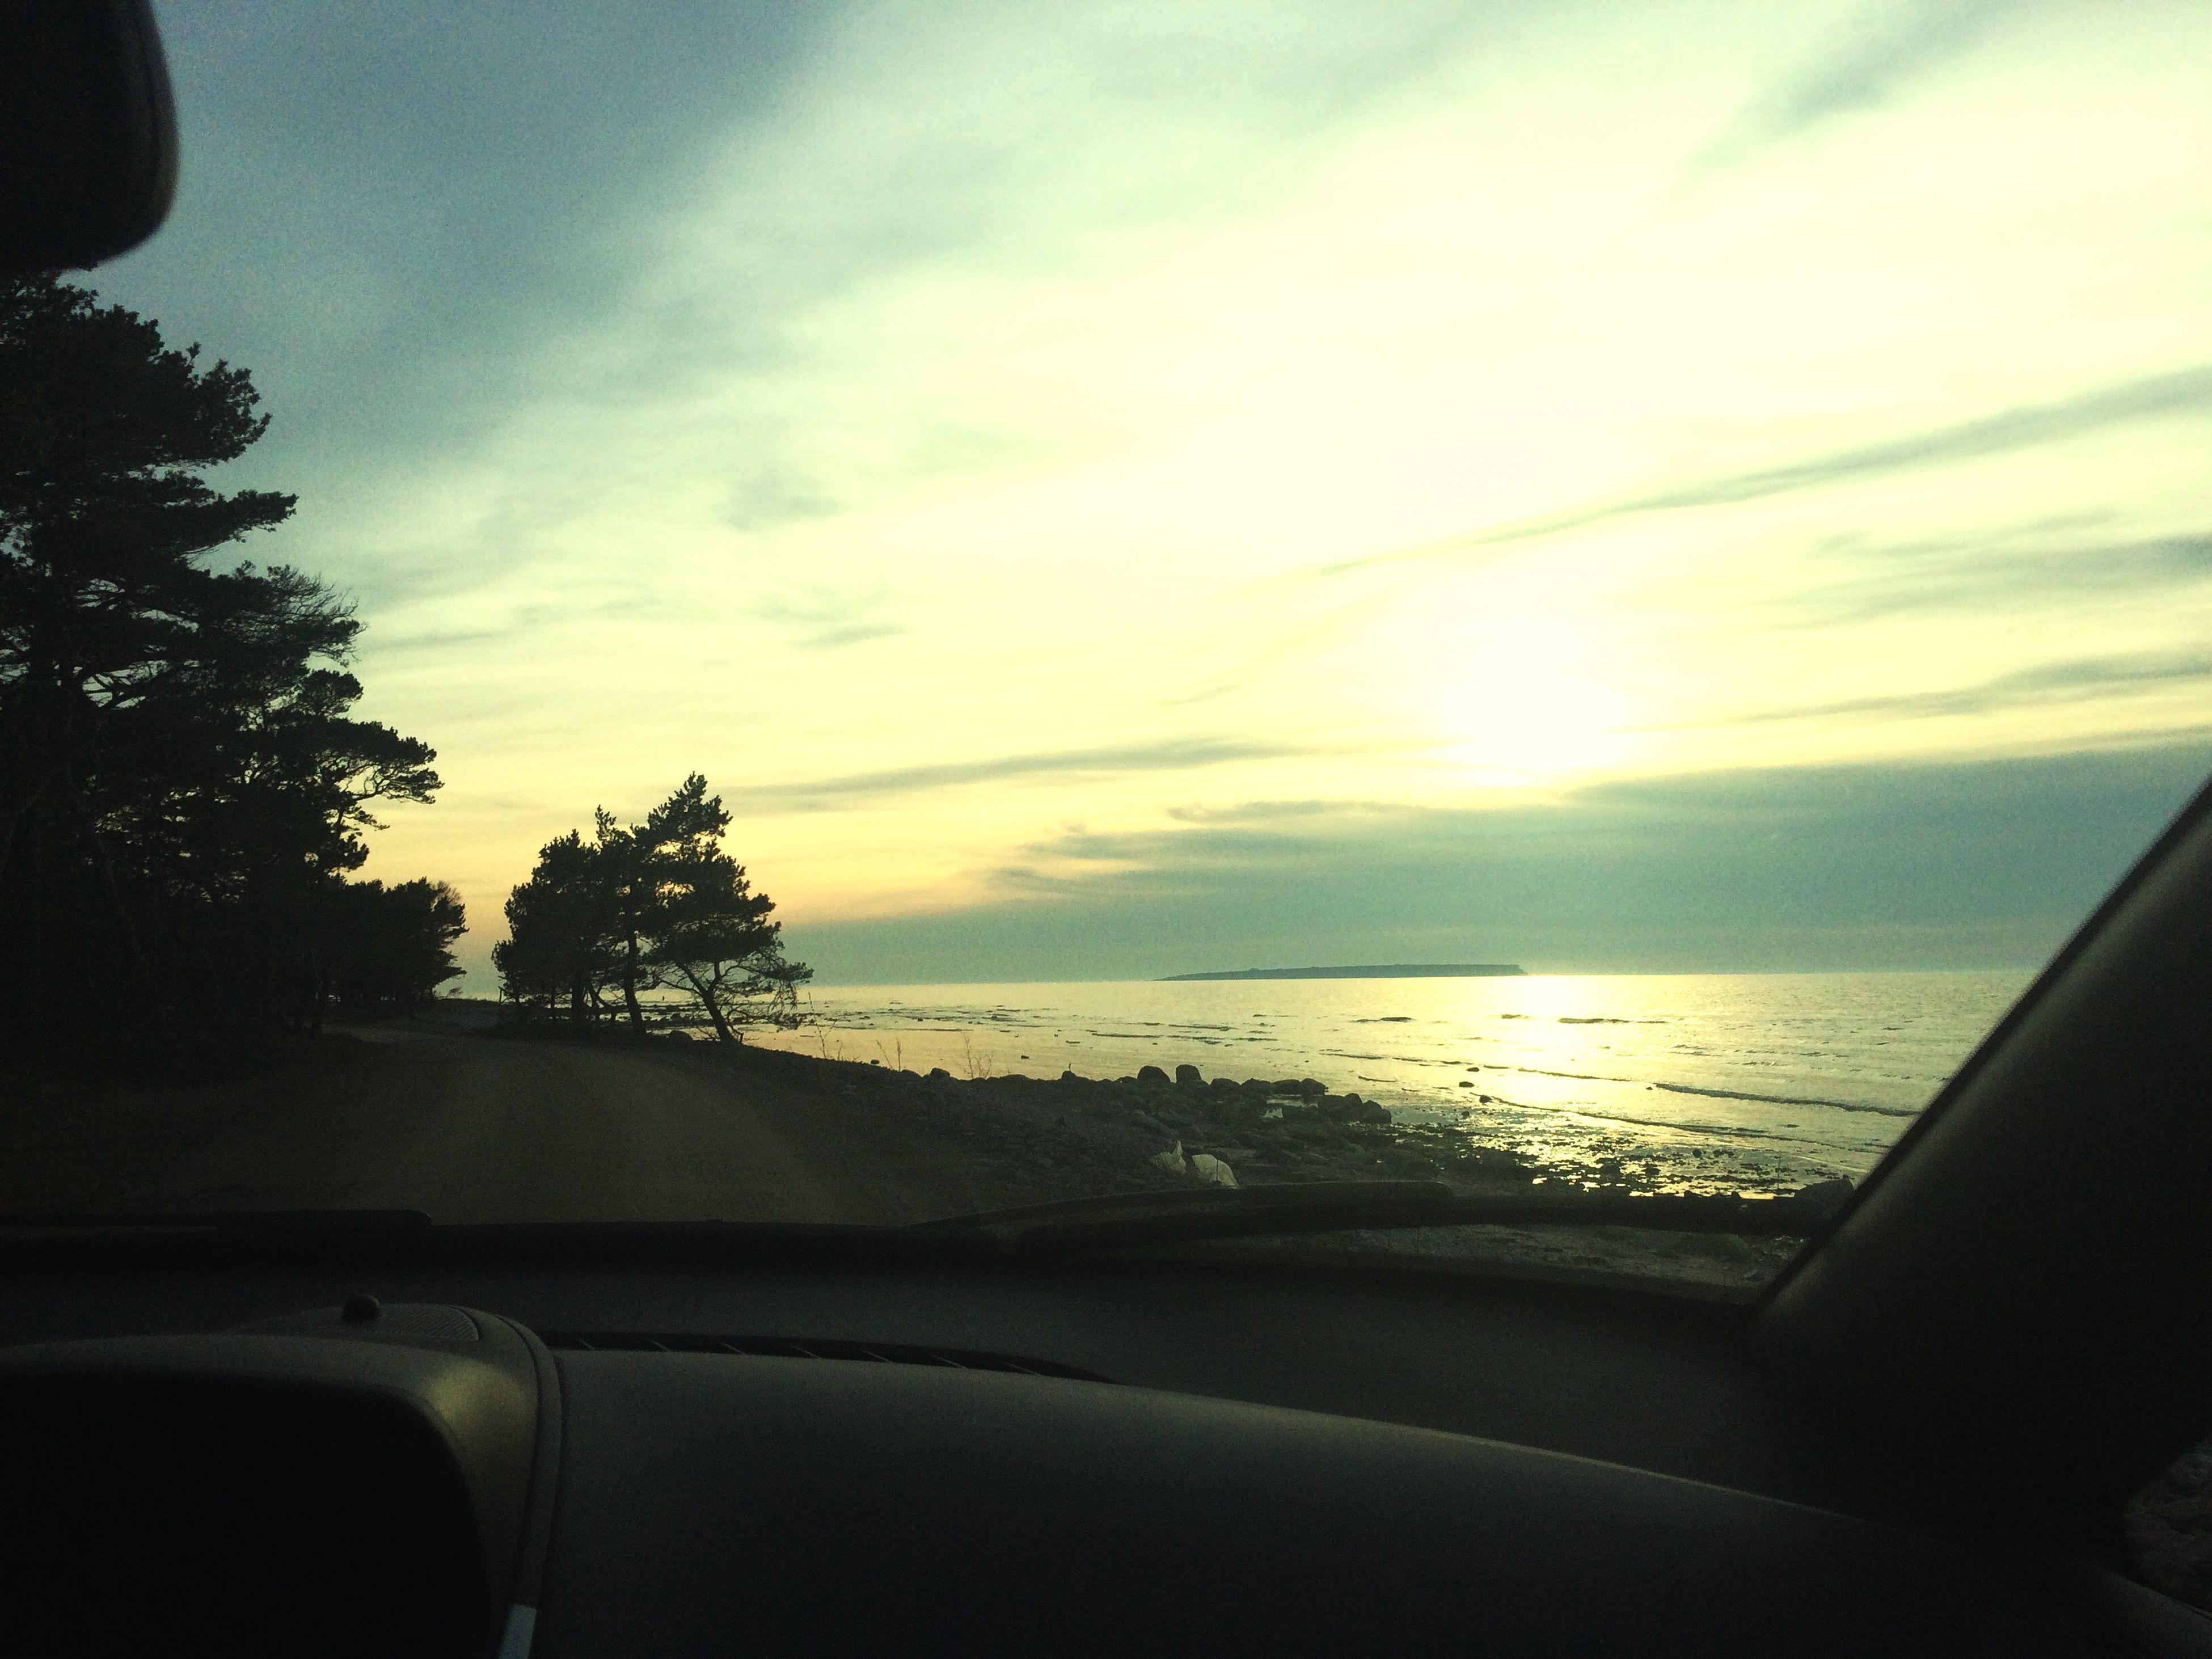 sea, sky, horizon over water, sunset, water, transportation, scenics, cloud - sky, mode of transport, beauty in nature, tranquil scene, beach, tranquility, nature, cloud, nautical vessel, shore, sun, idyllic, car